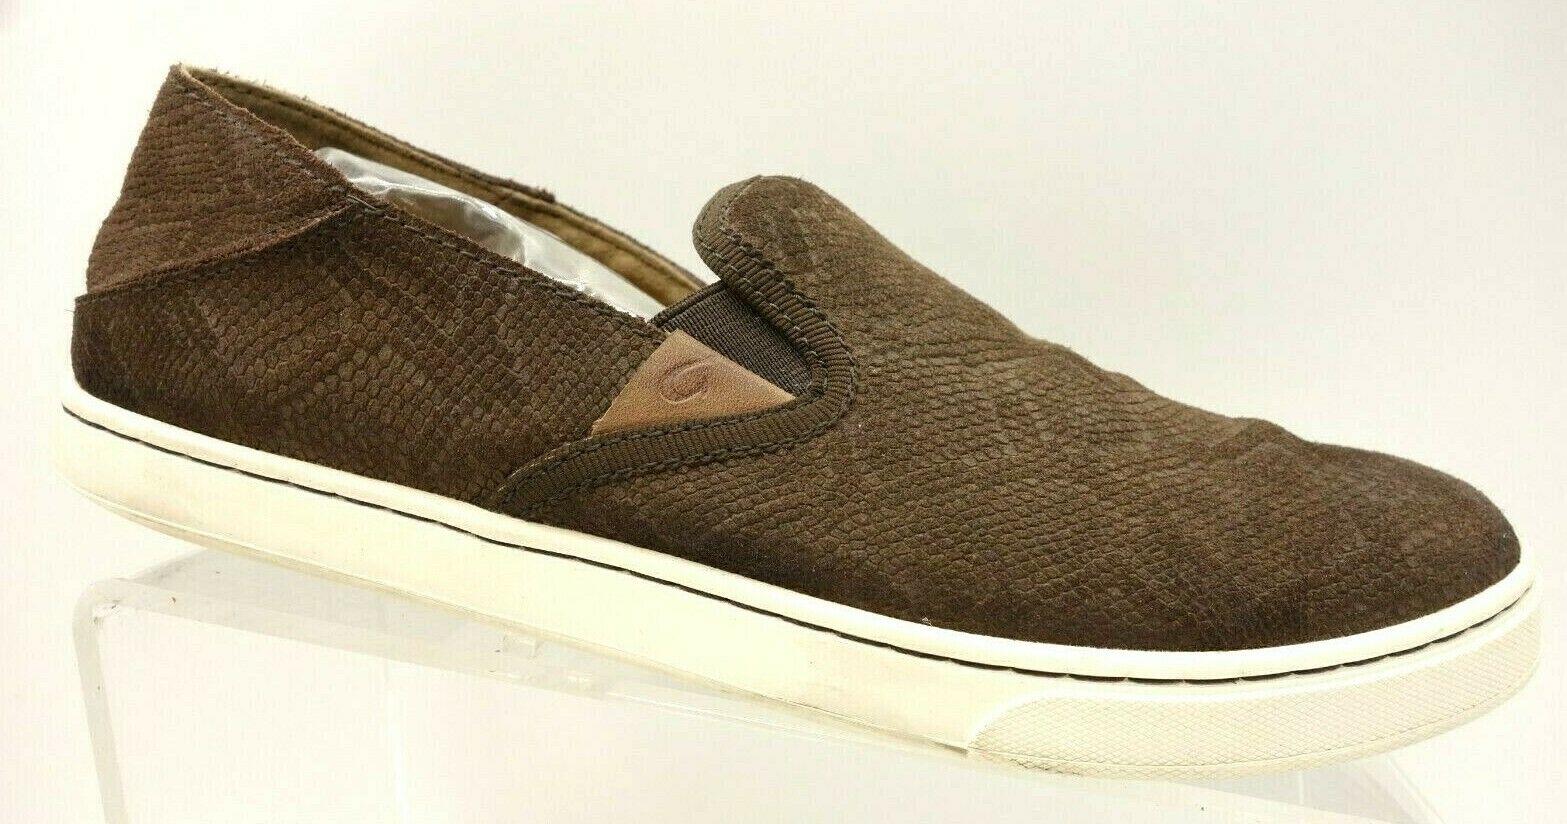 Olukai Brown Snakeskin Print Leather Casual Slip On Sneakers shoes Women's 9